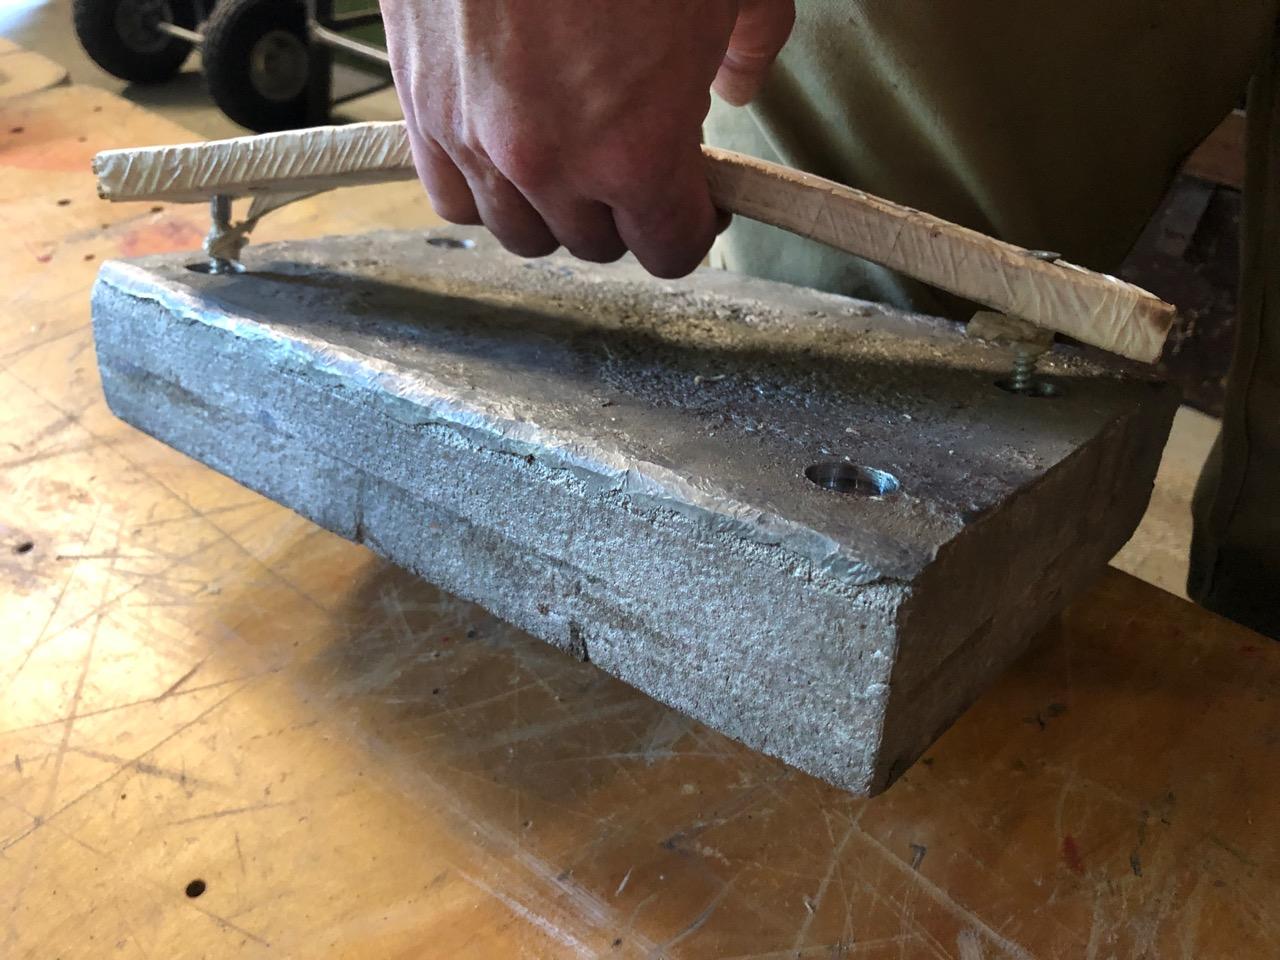 Tile lifting device